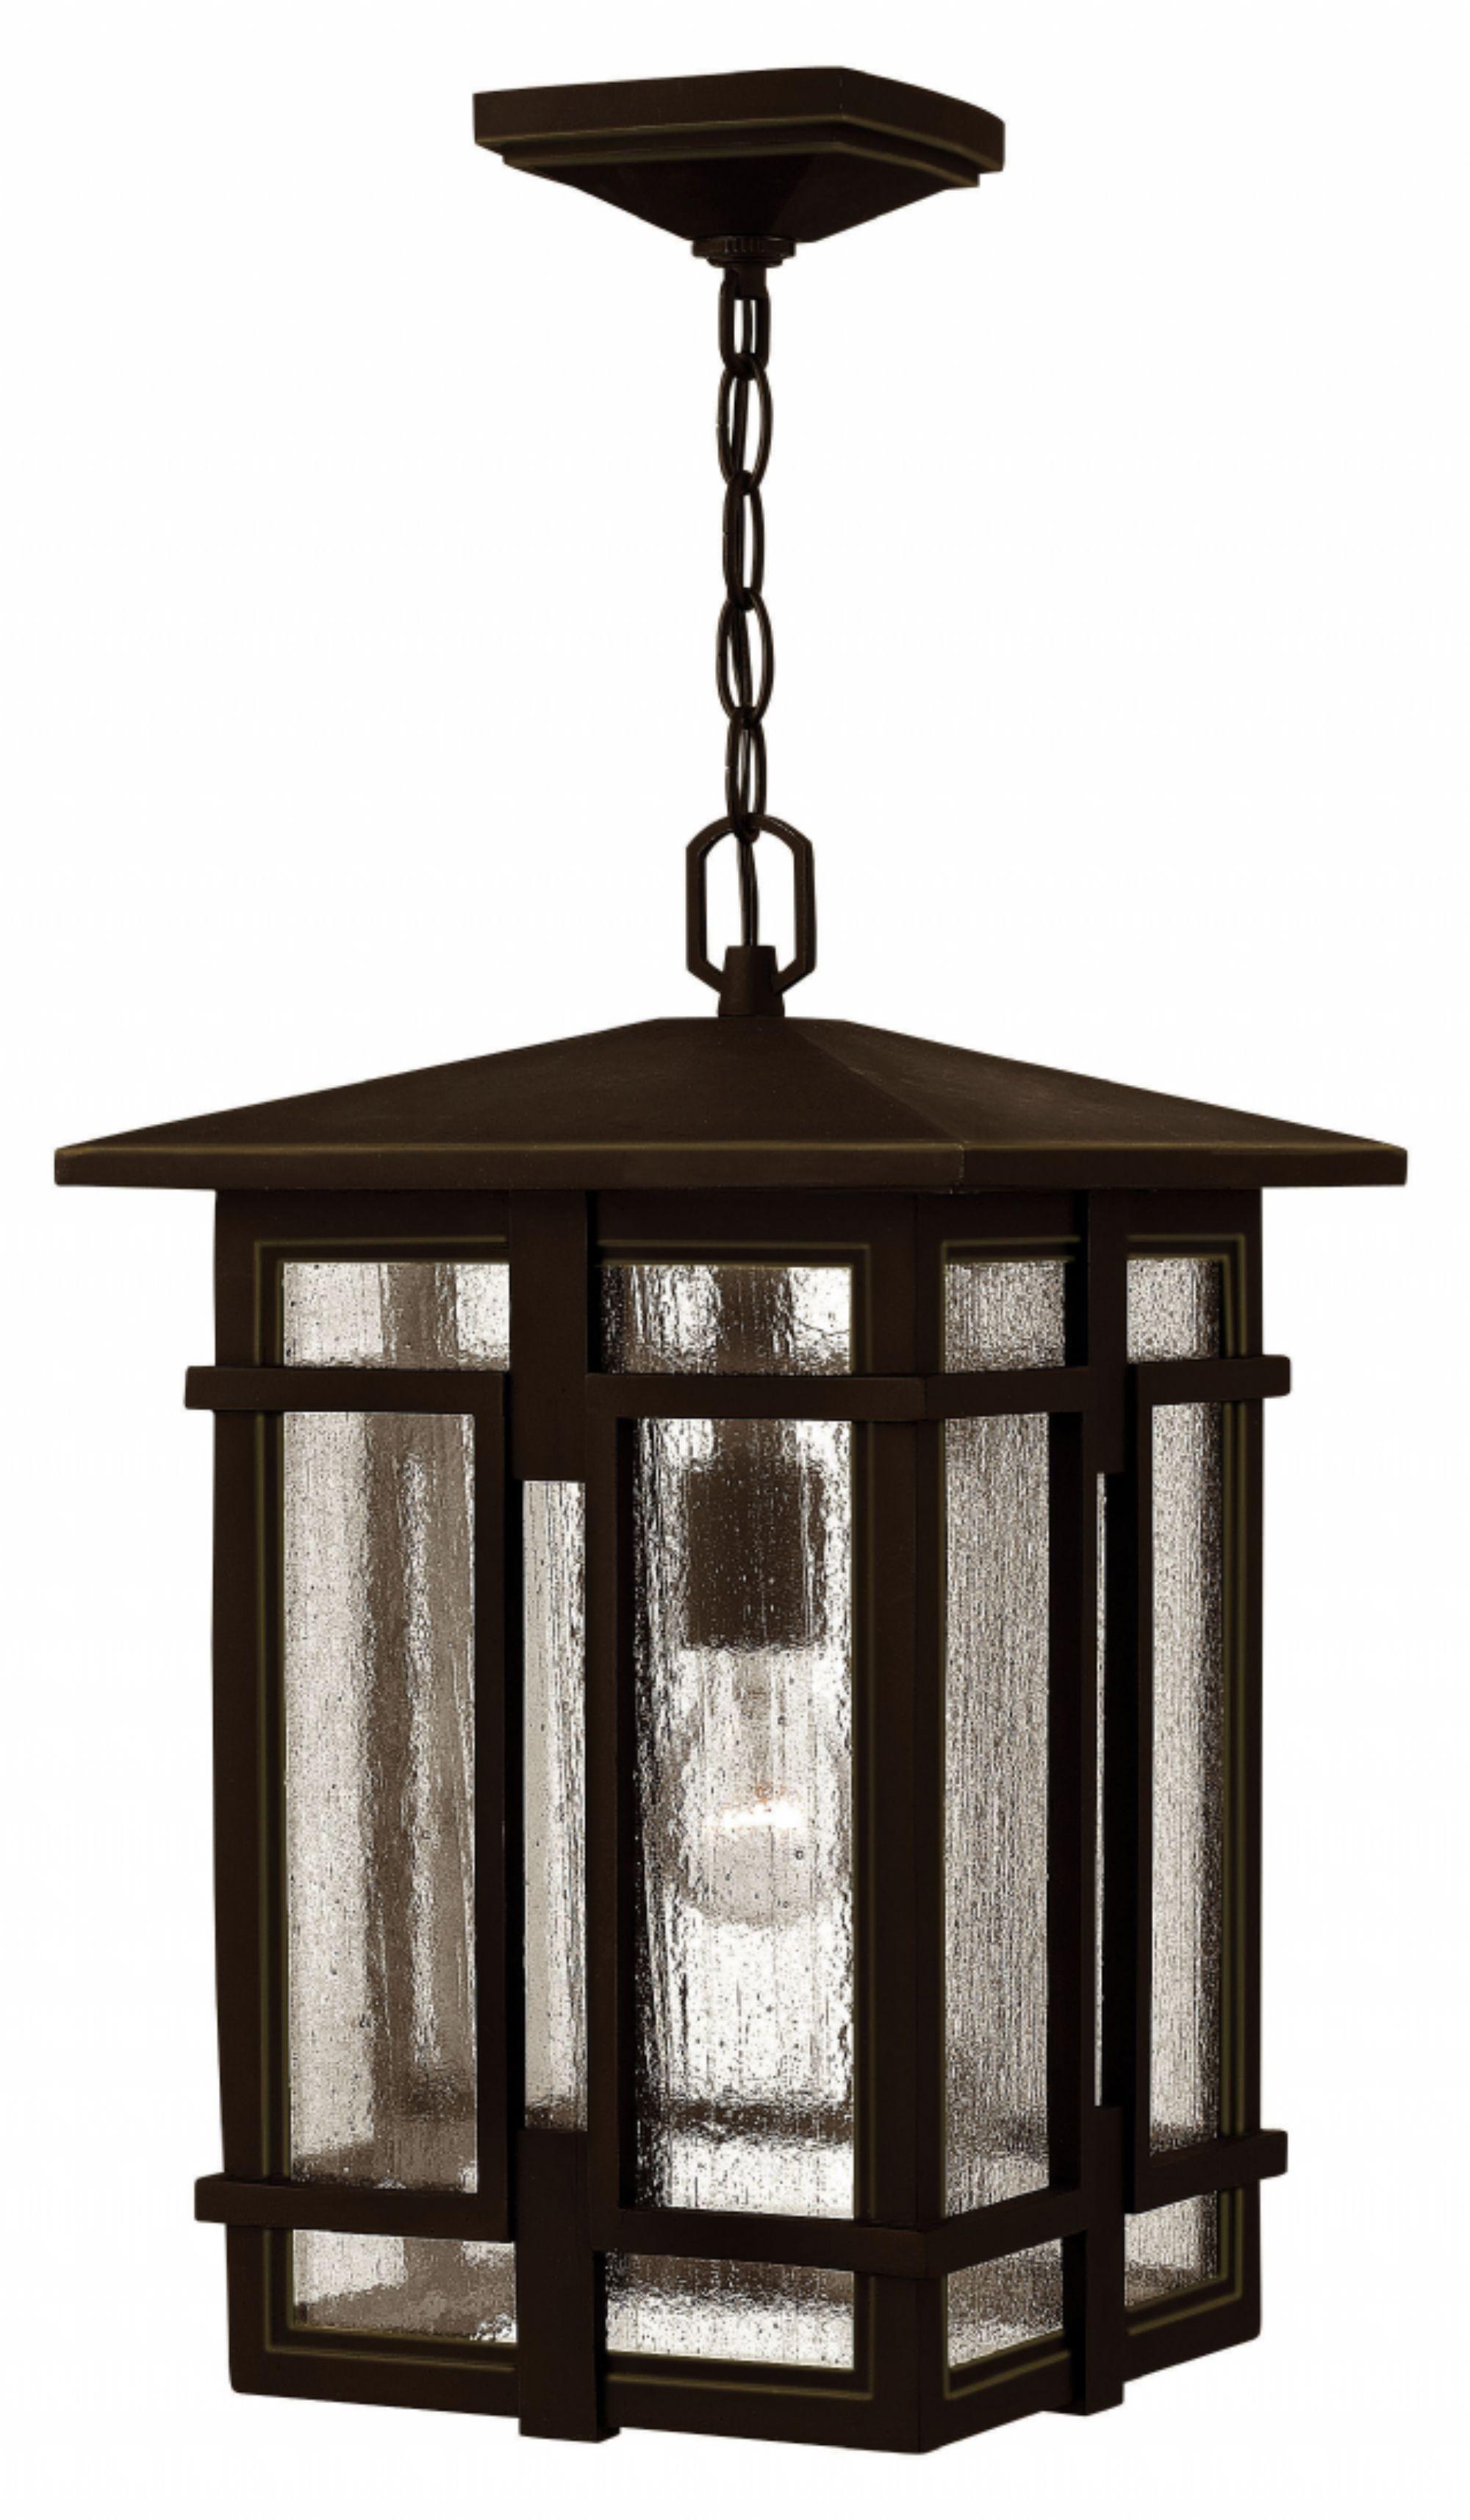 craftsman style outdoor pendant lighting # 3